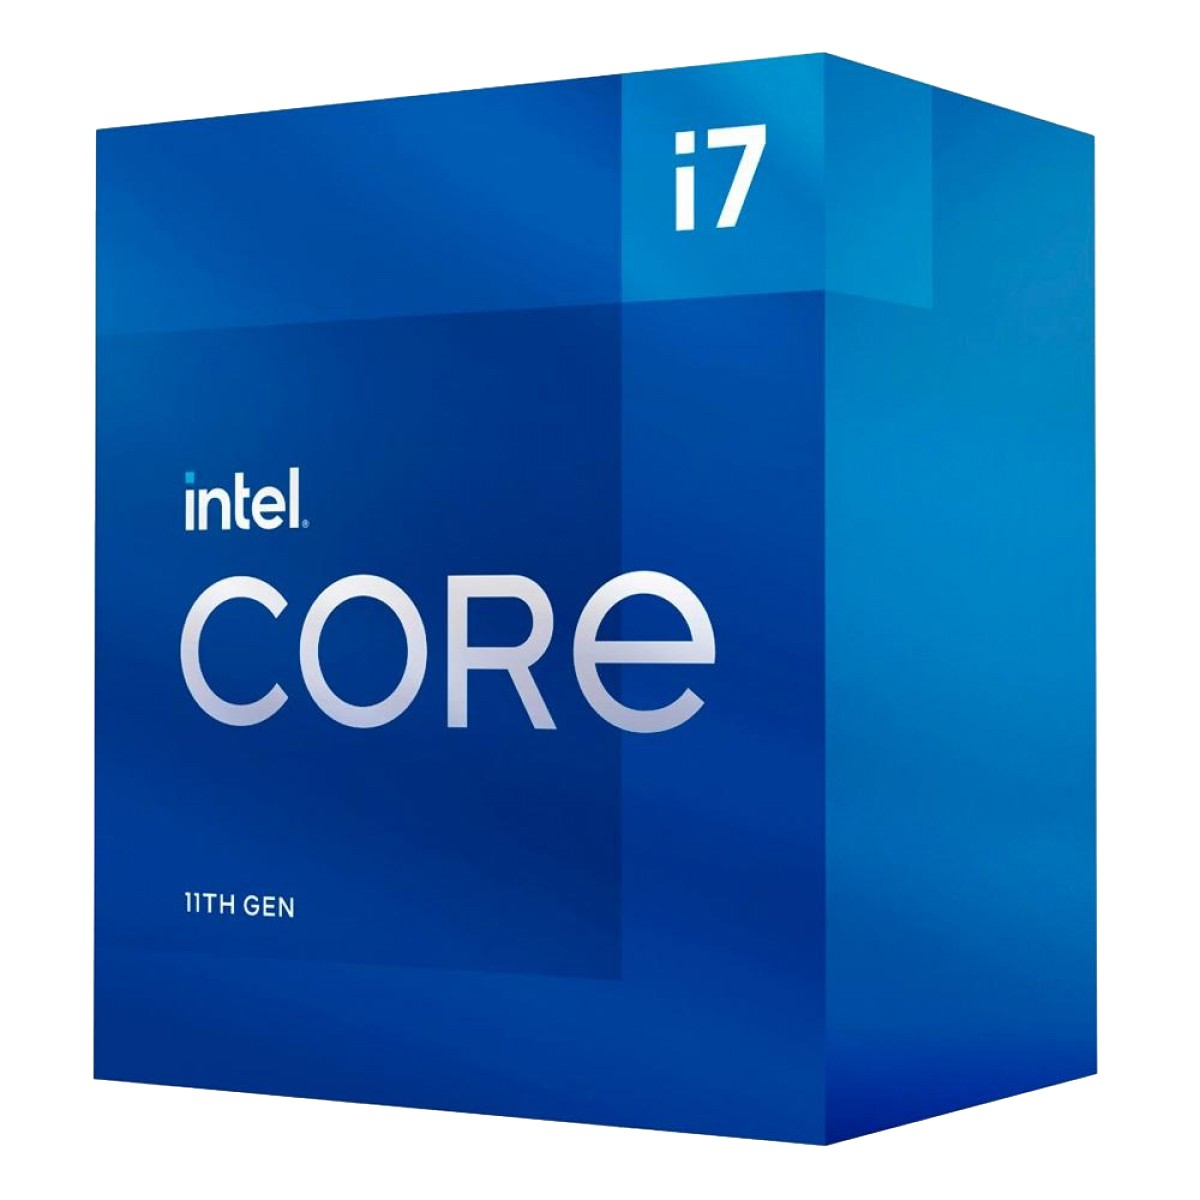 Kit Upgrade, ASRock B560 Steel Legend + Intel Core i7 11700